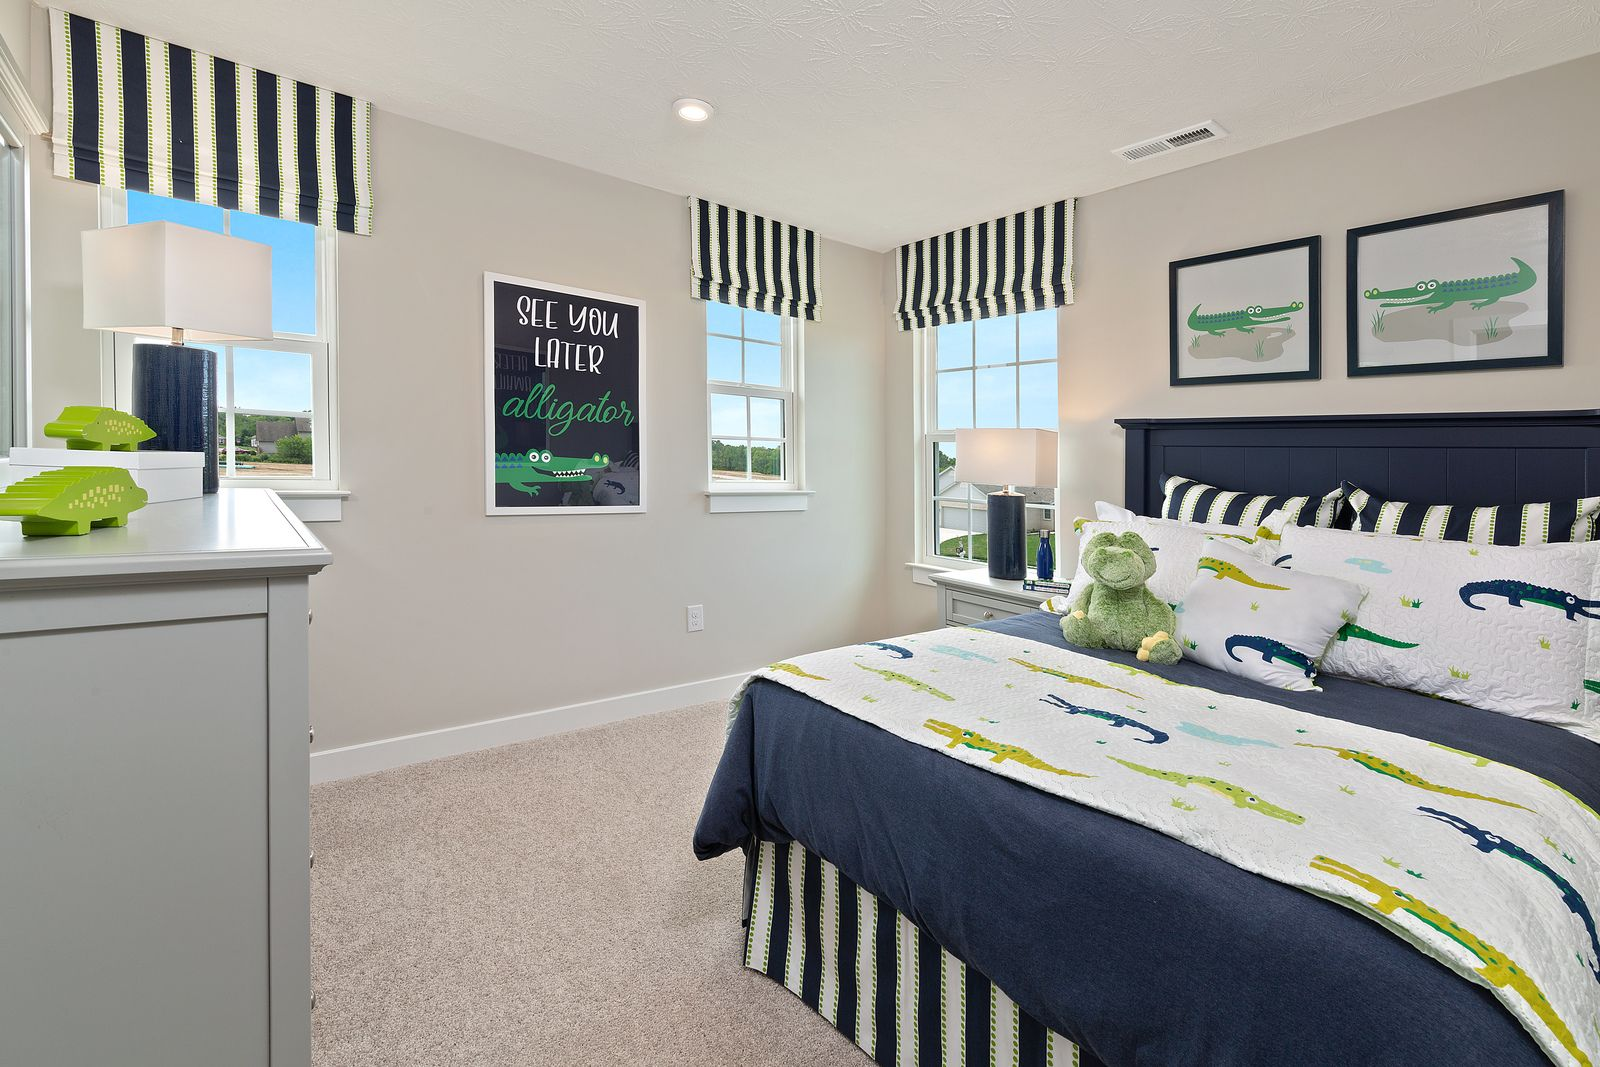 Bedroom featured in the Allegheny By HeartlandHomes in Morgantown, WV